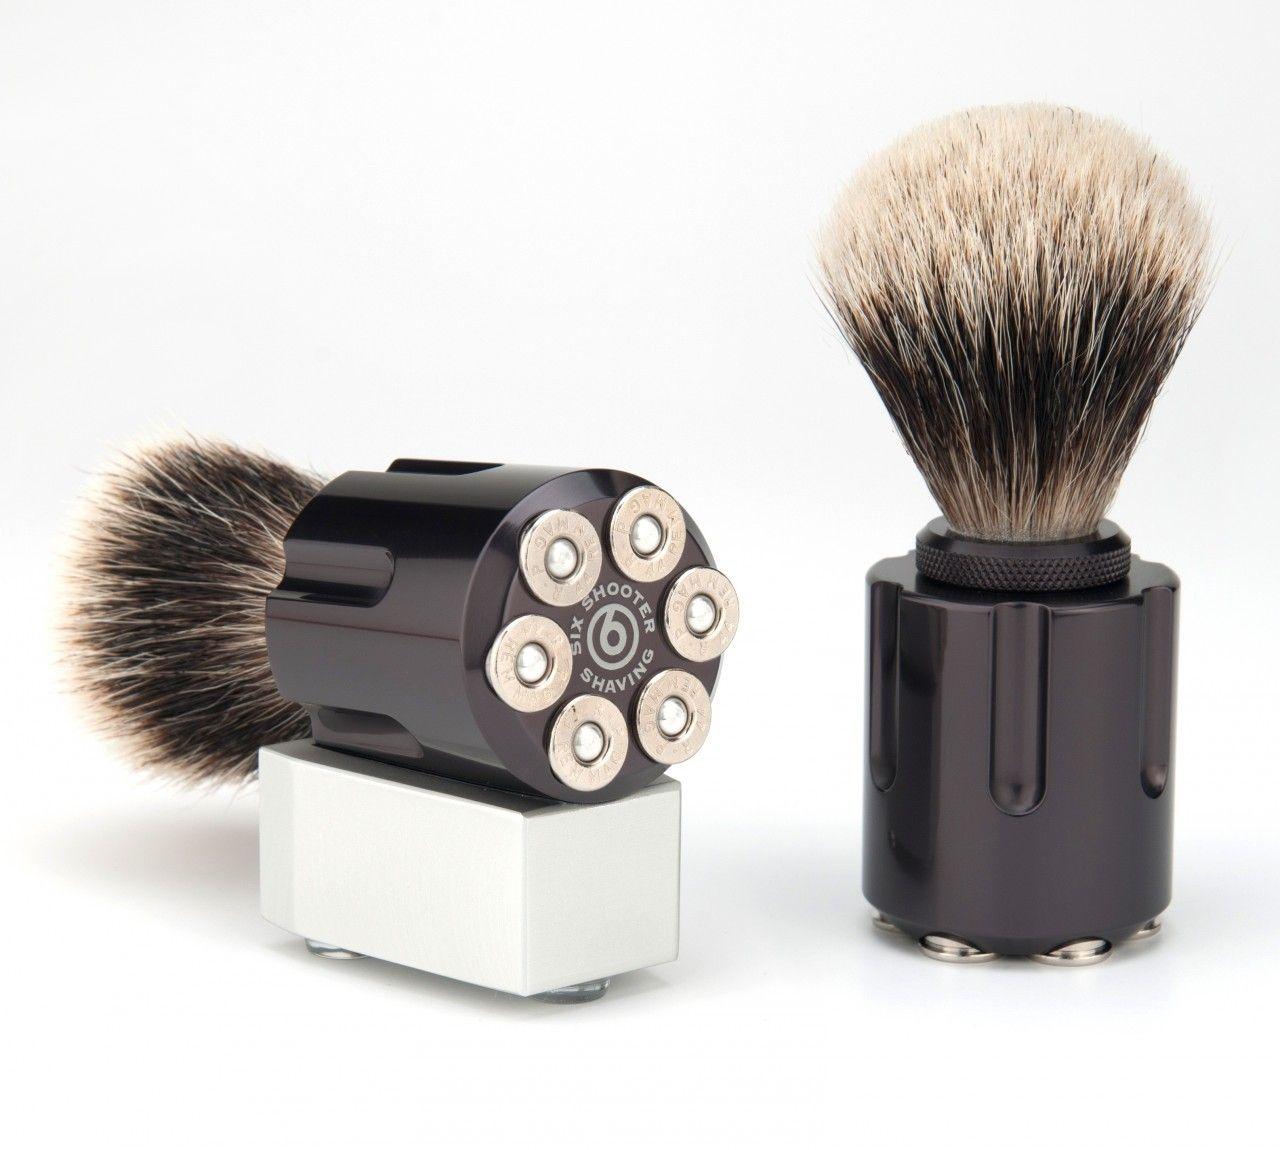 Six Shooter Shave Brush by Six Shooter Shaving. Shaving